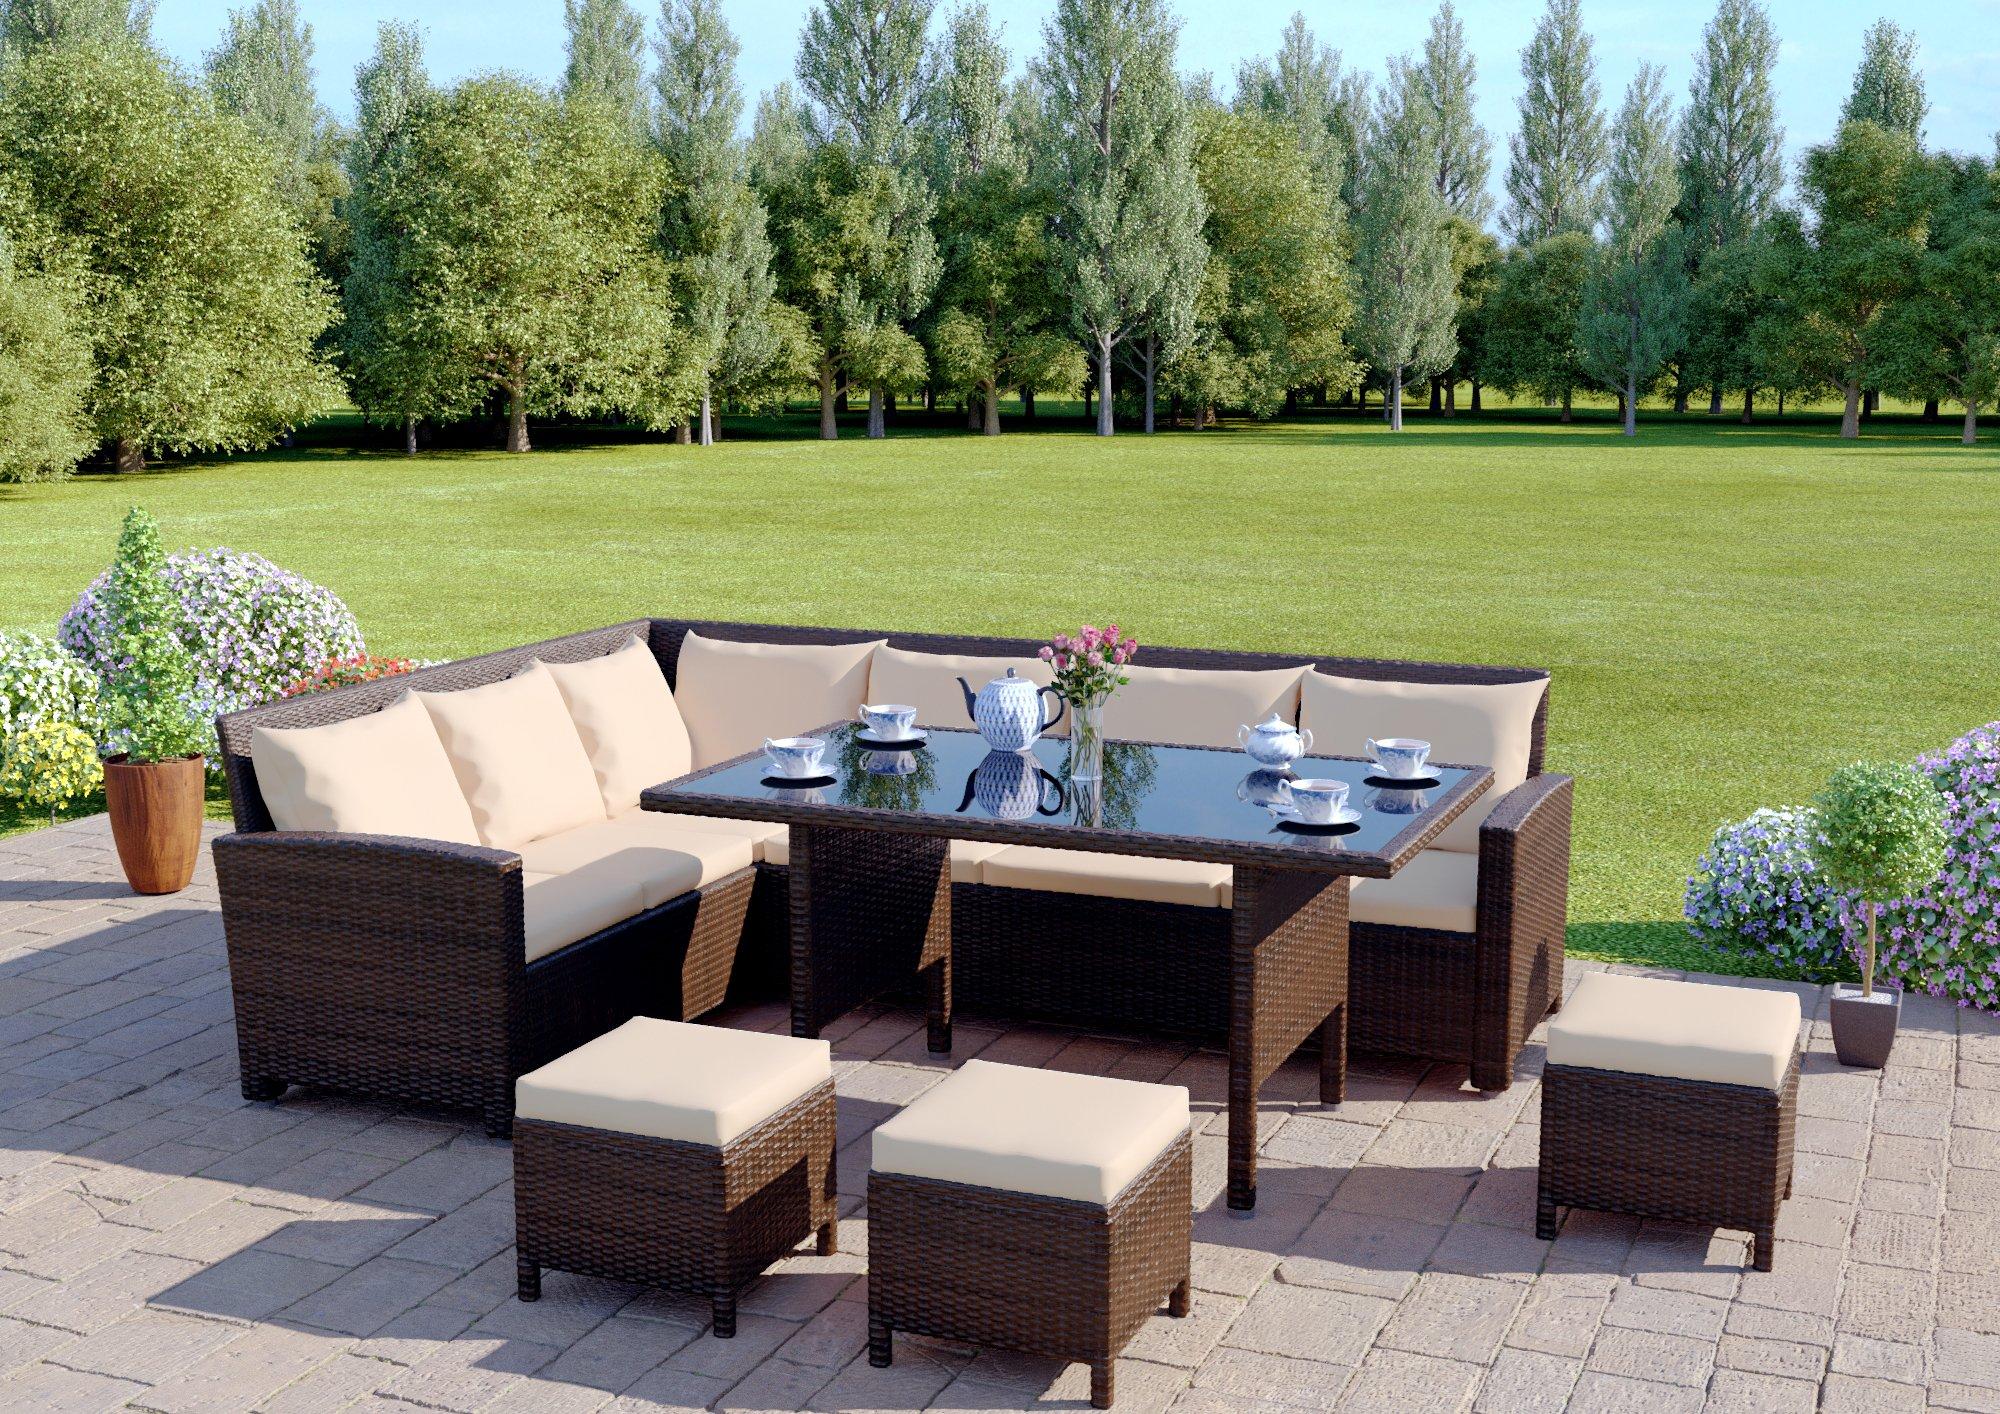 Abreo Rattan Dining Set Furniture Garden Corner 9 Seater ...